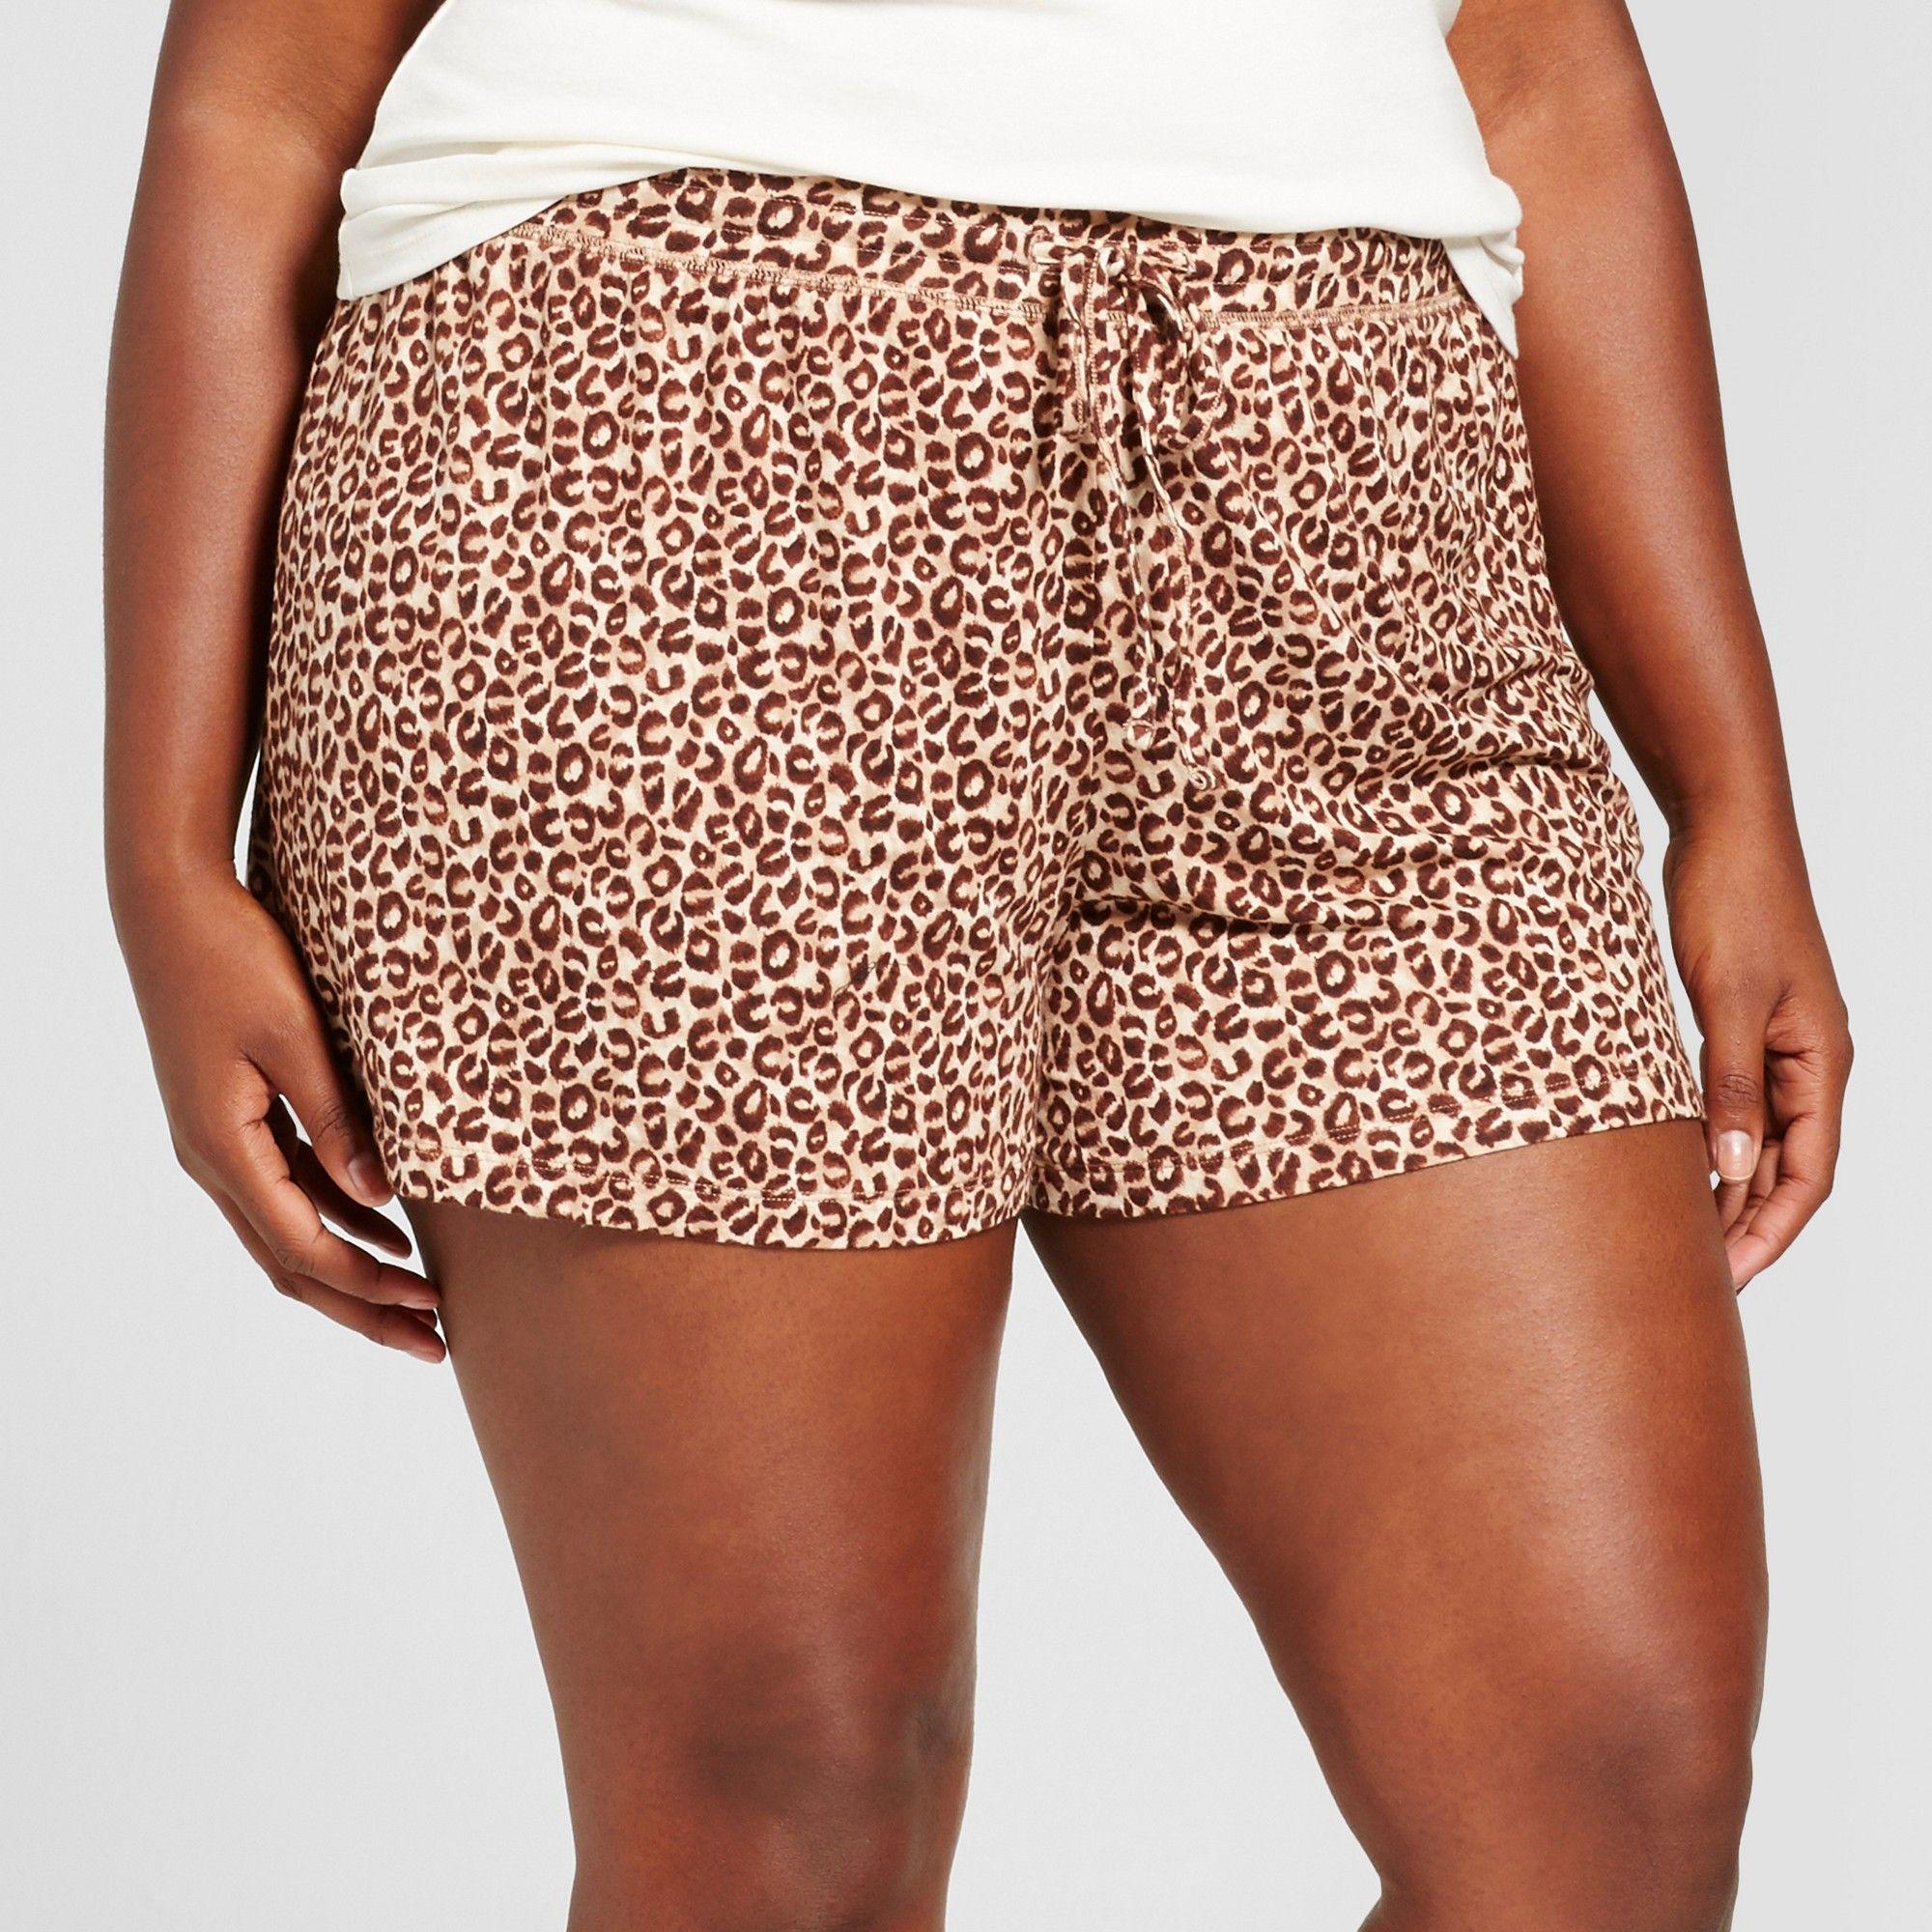 e8821951dc4c Women s Plus Size Pajama Shorts Black 2X